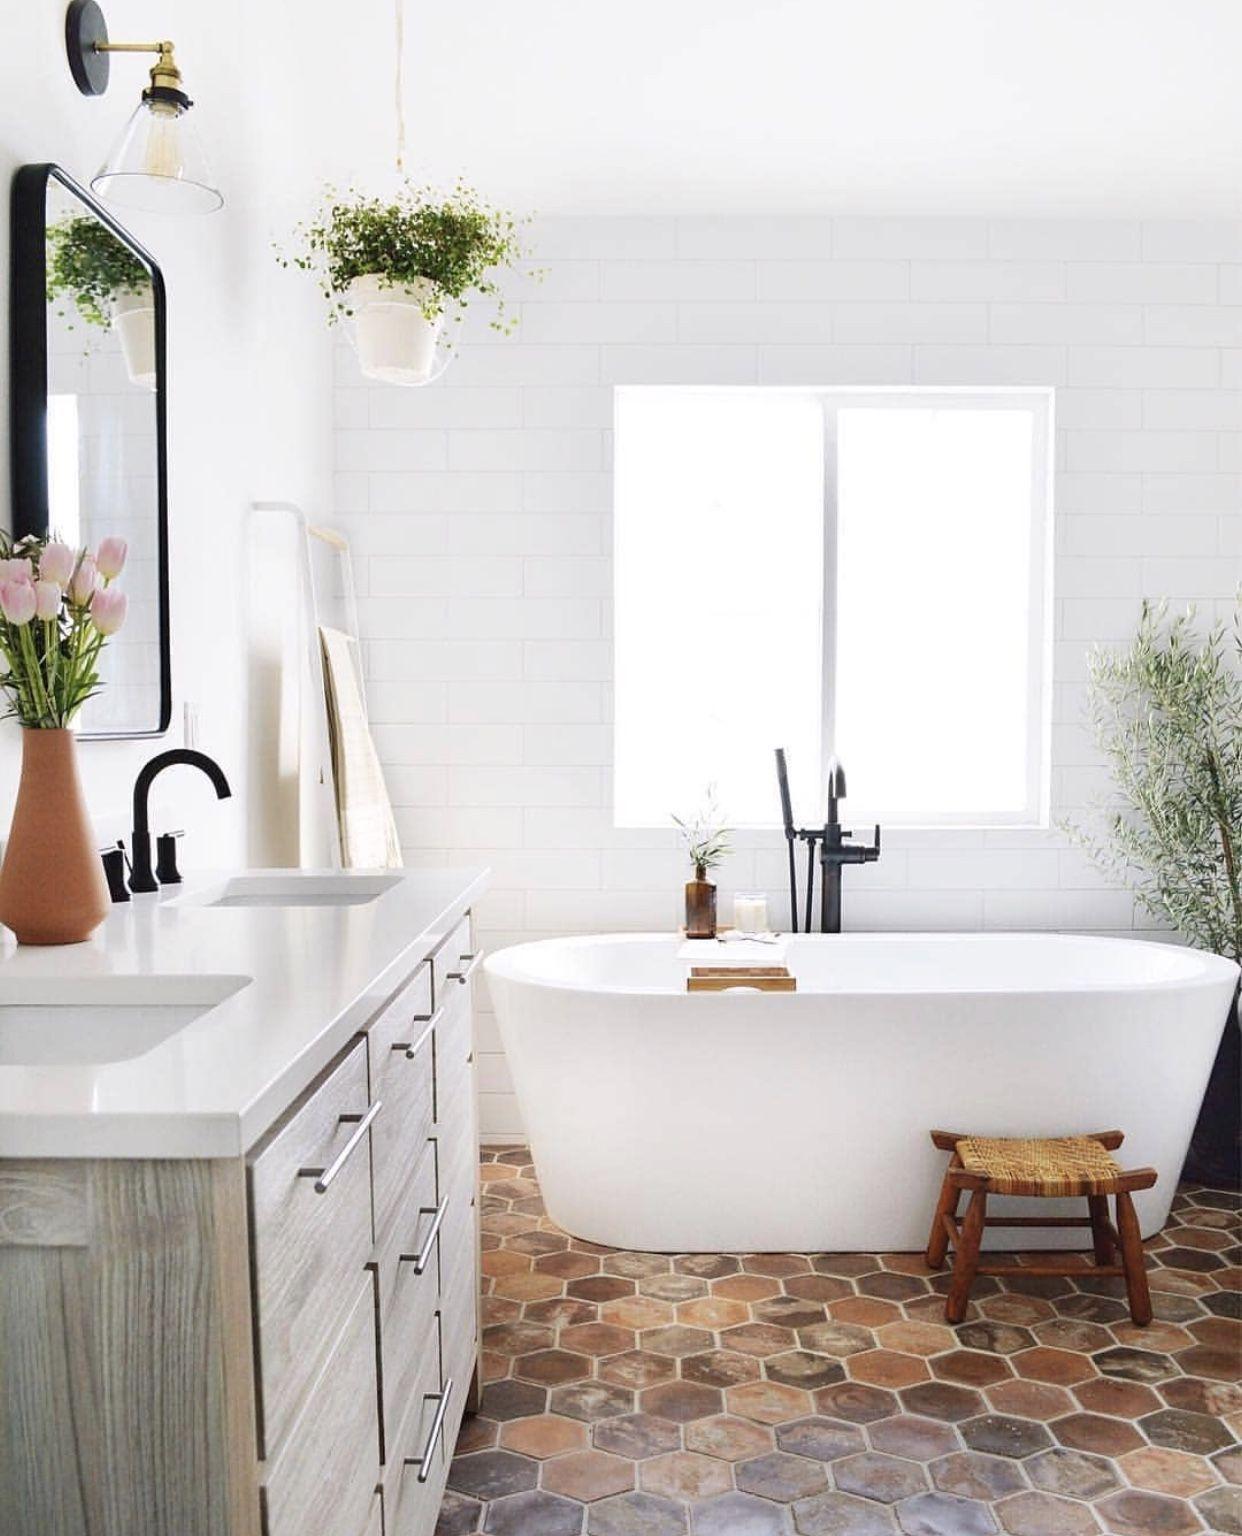 bathroom  Salles de bains de style espagnol, Décoration salle de